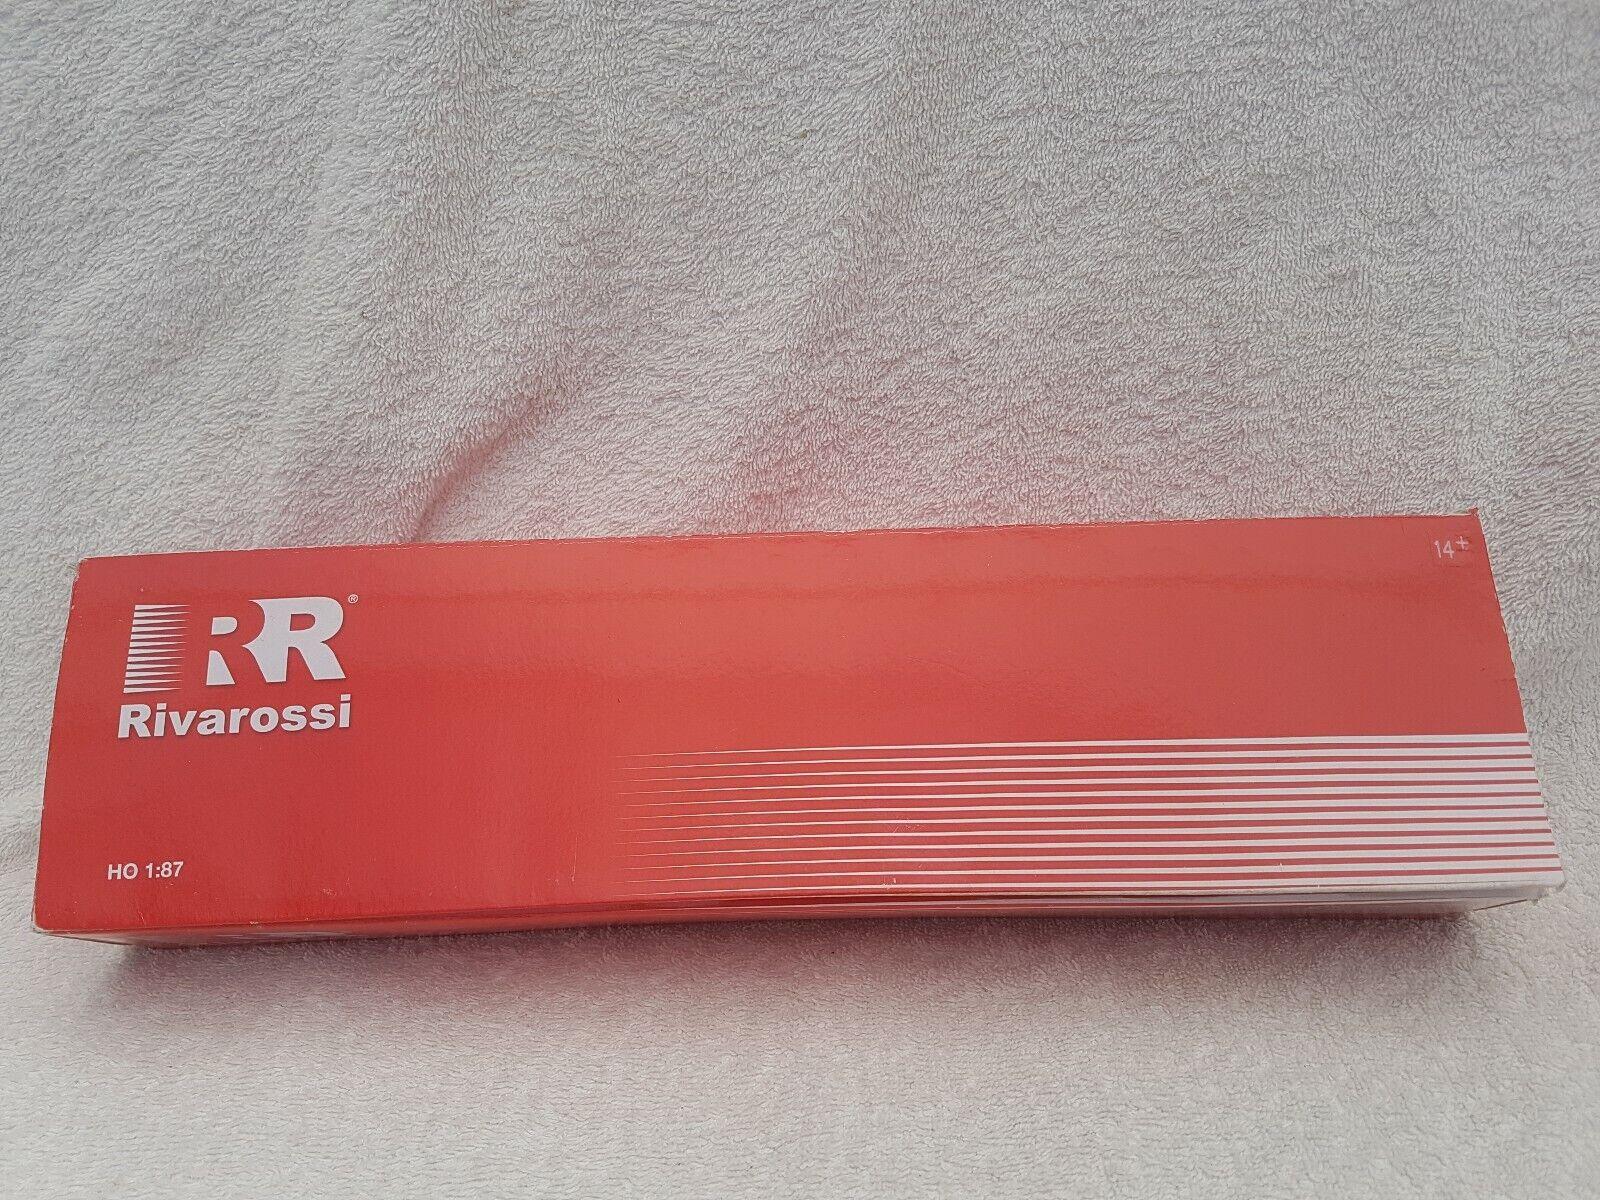 Rivarossi HR2050 DB classe 230 Diesel HO 1 87 DCC Digital suono System Excellent